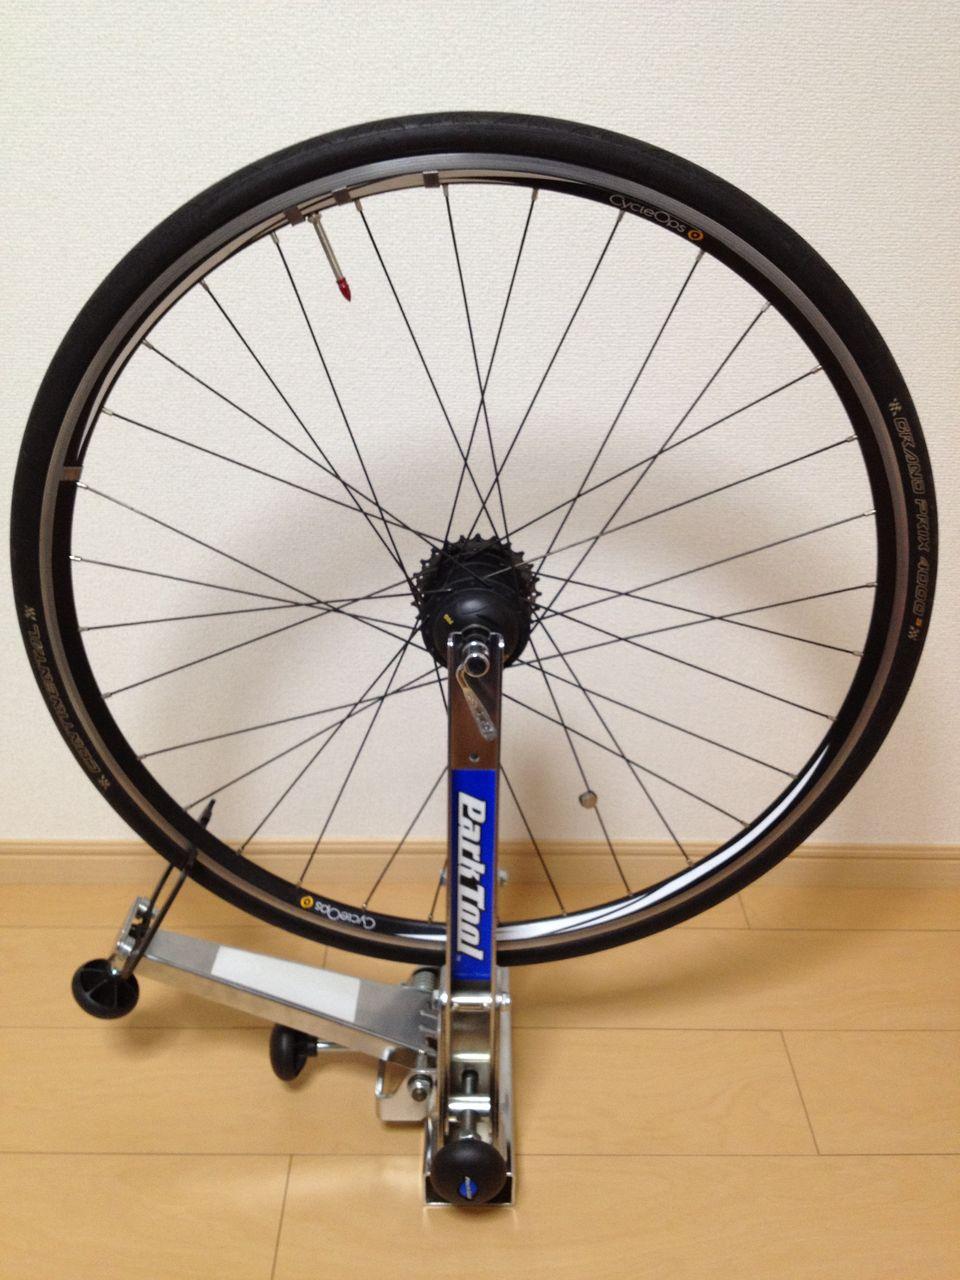 Bicycle Laboratory自転車ブログ:簡単ホイールバランス取り - livedoor ...